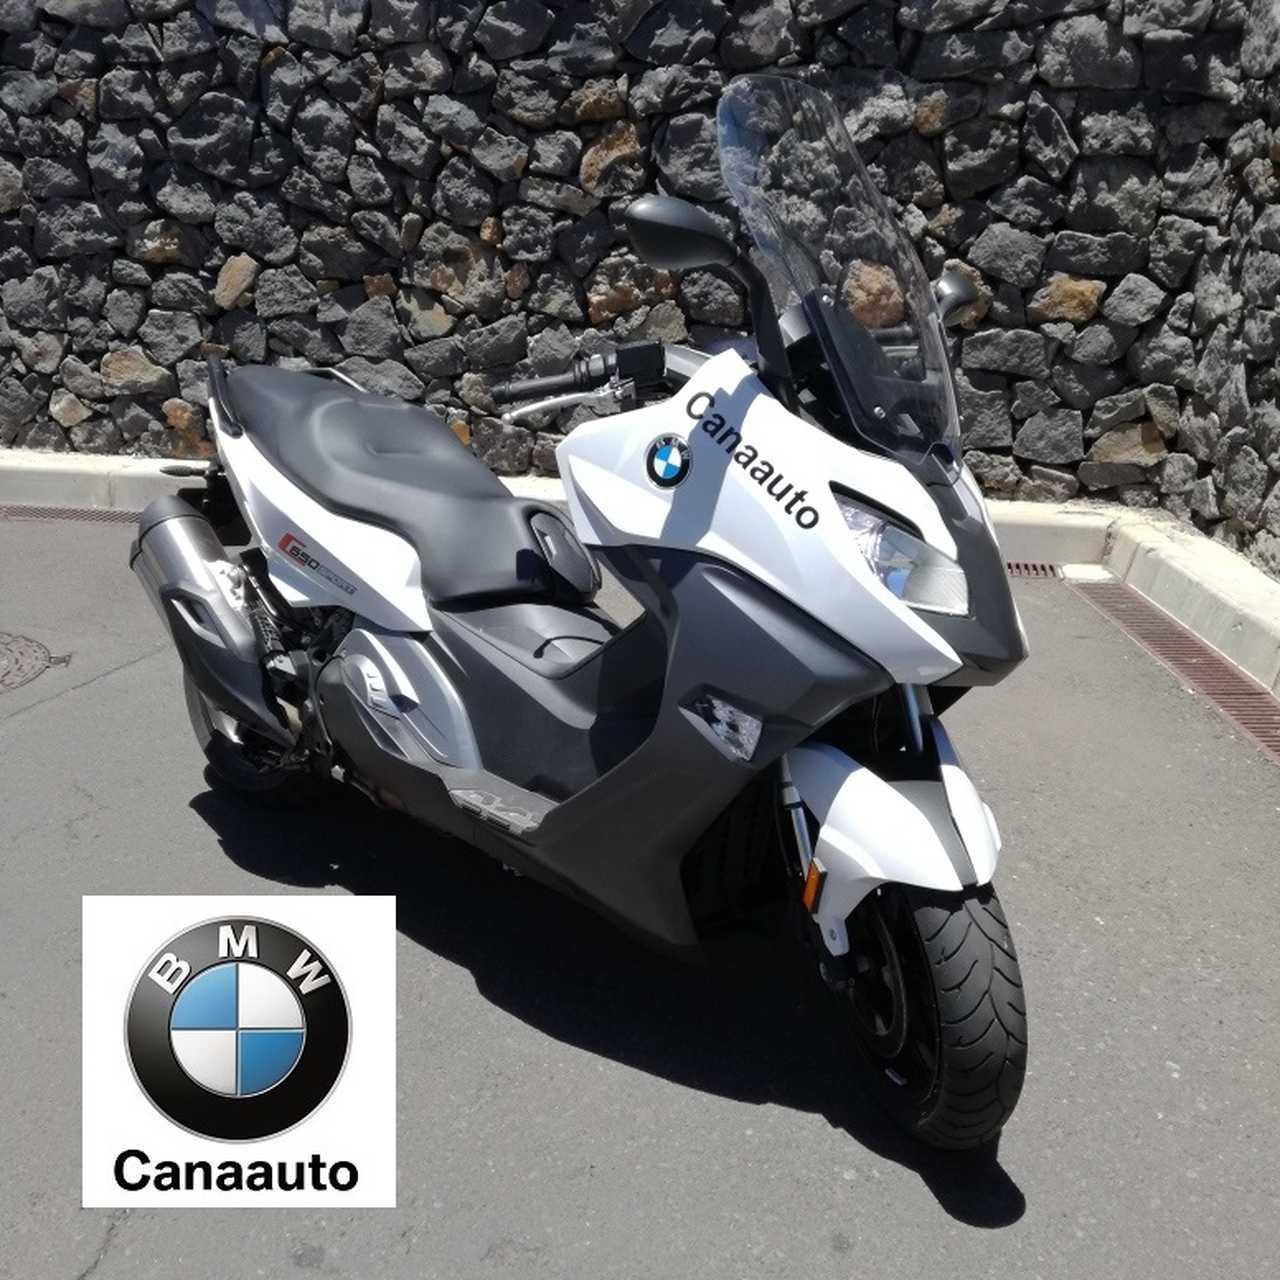 BMW C 600 Sport BMW Motorrad C 600 Sport 59 CV  - Foto 1